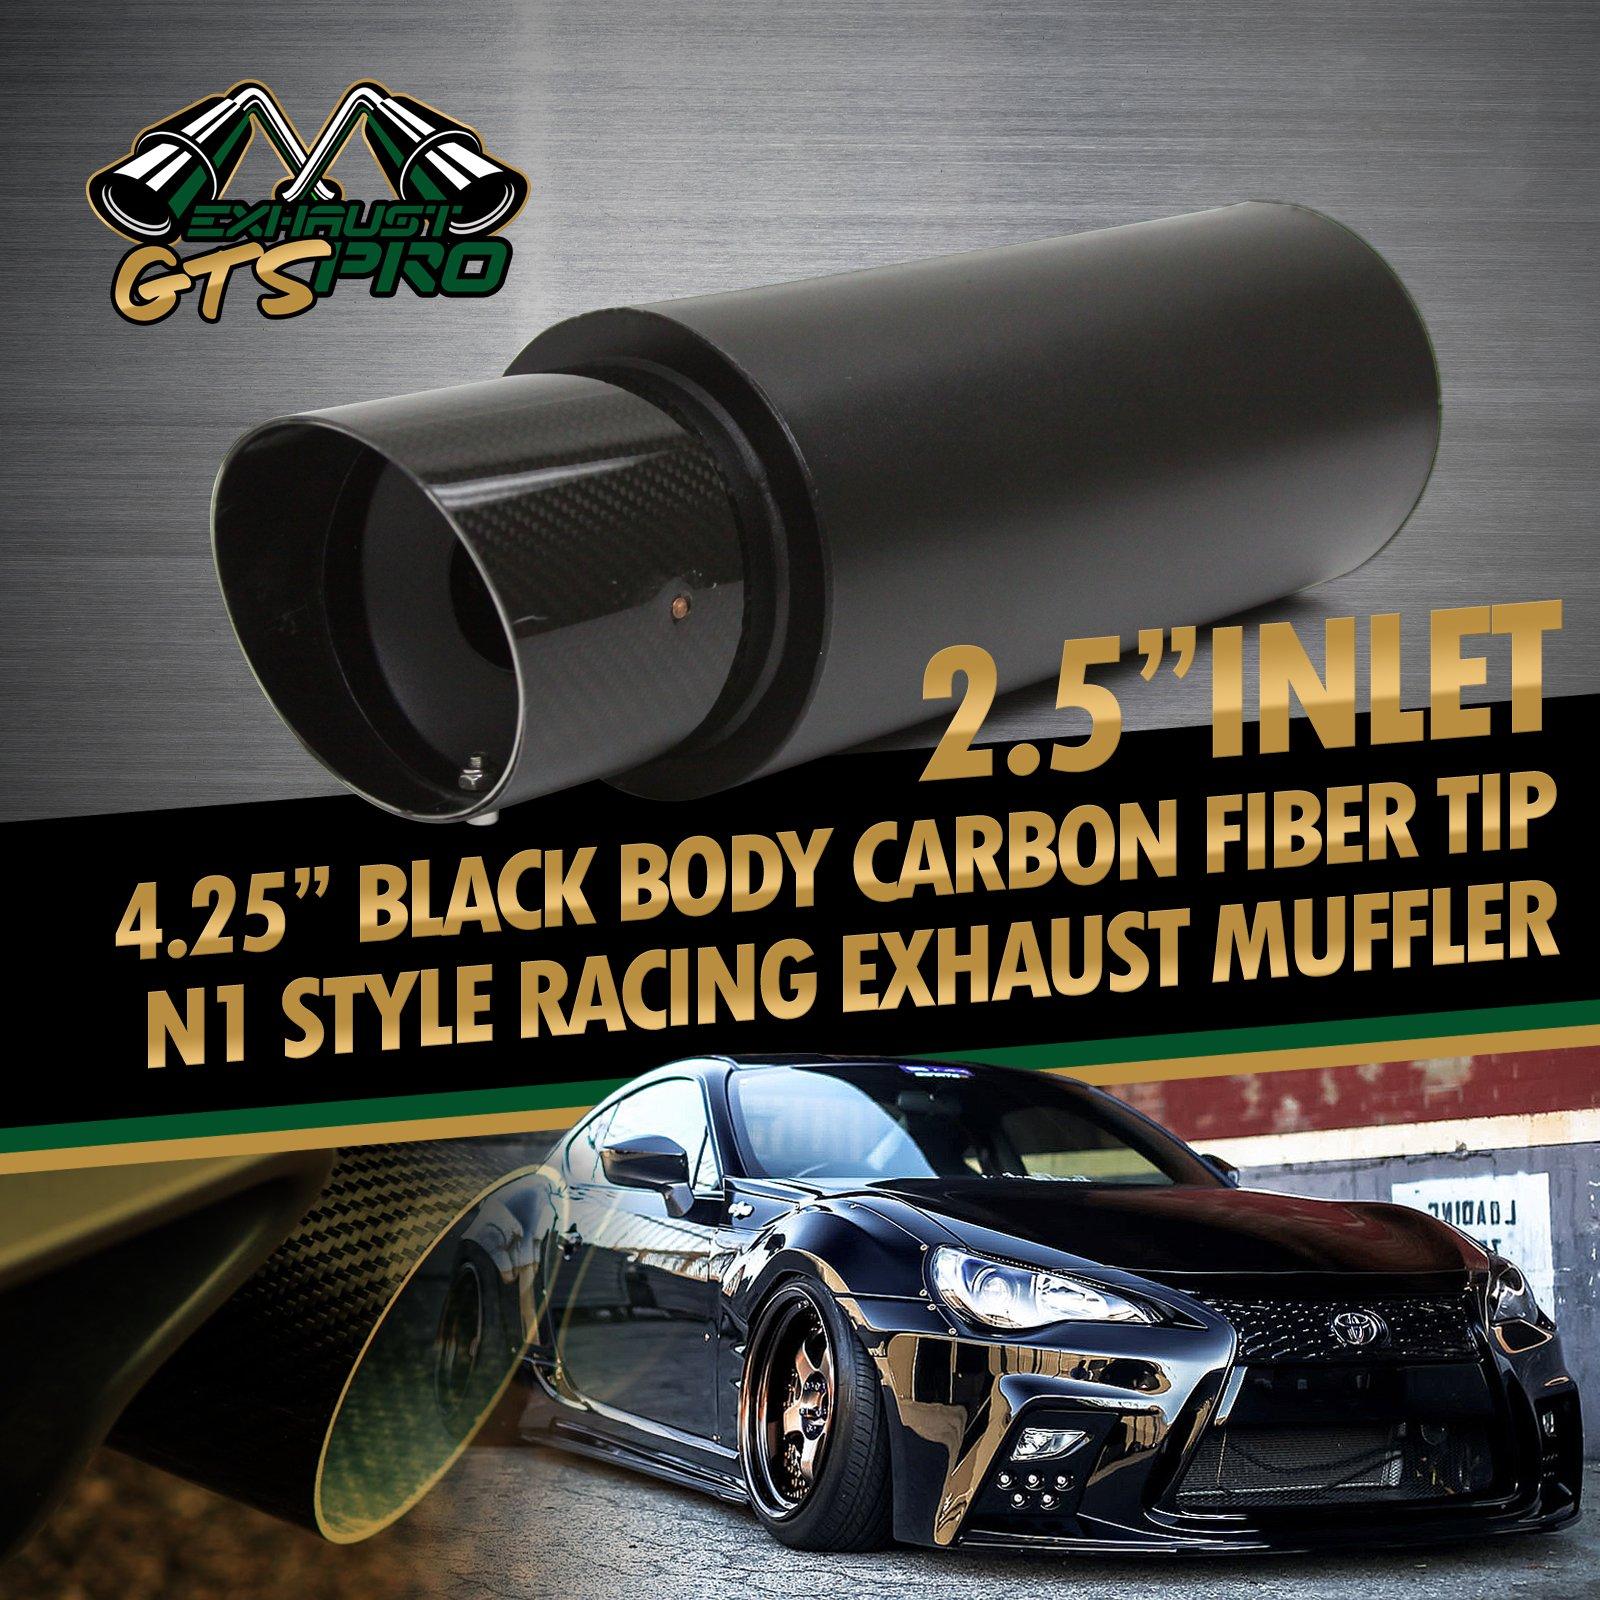 "FOR JPN CAR! 1X USA N1 STYLE DEEP TONE TRACK RACE EXHAUST MUFFLER +4.25"" CF TIP"